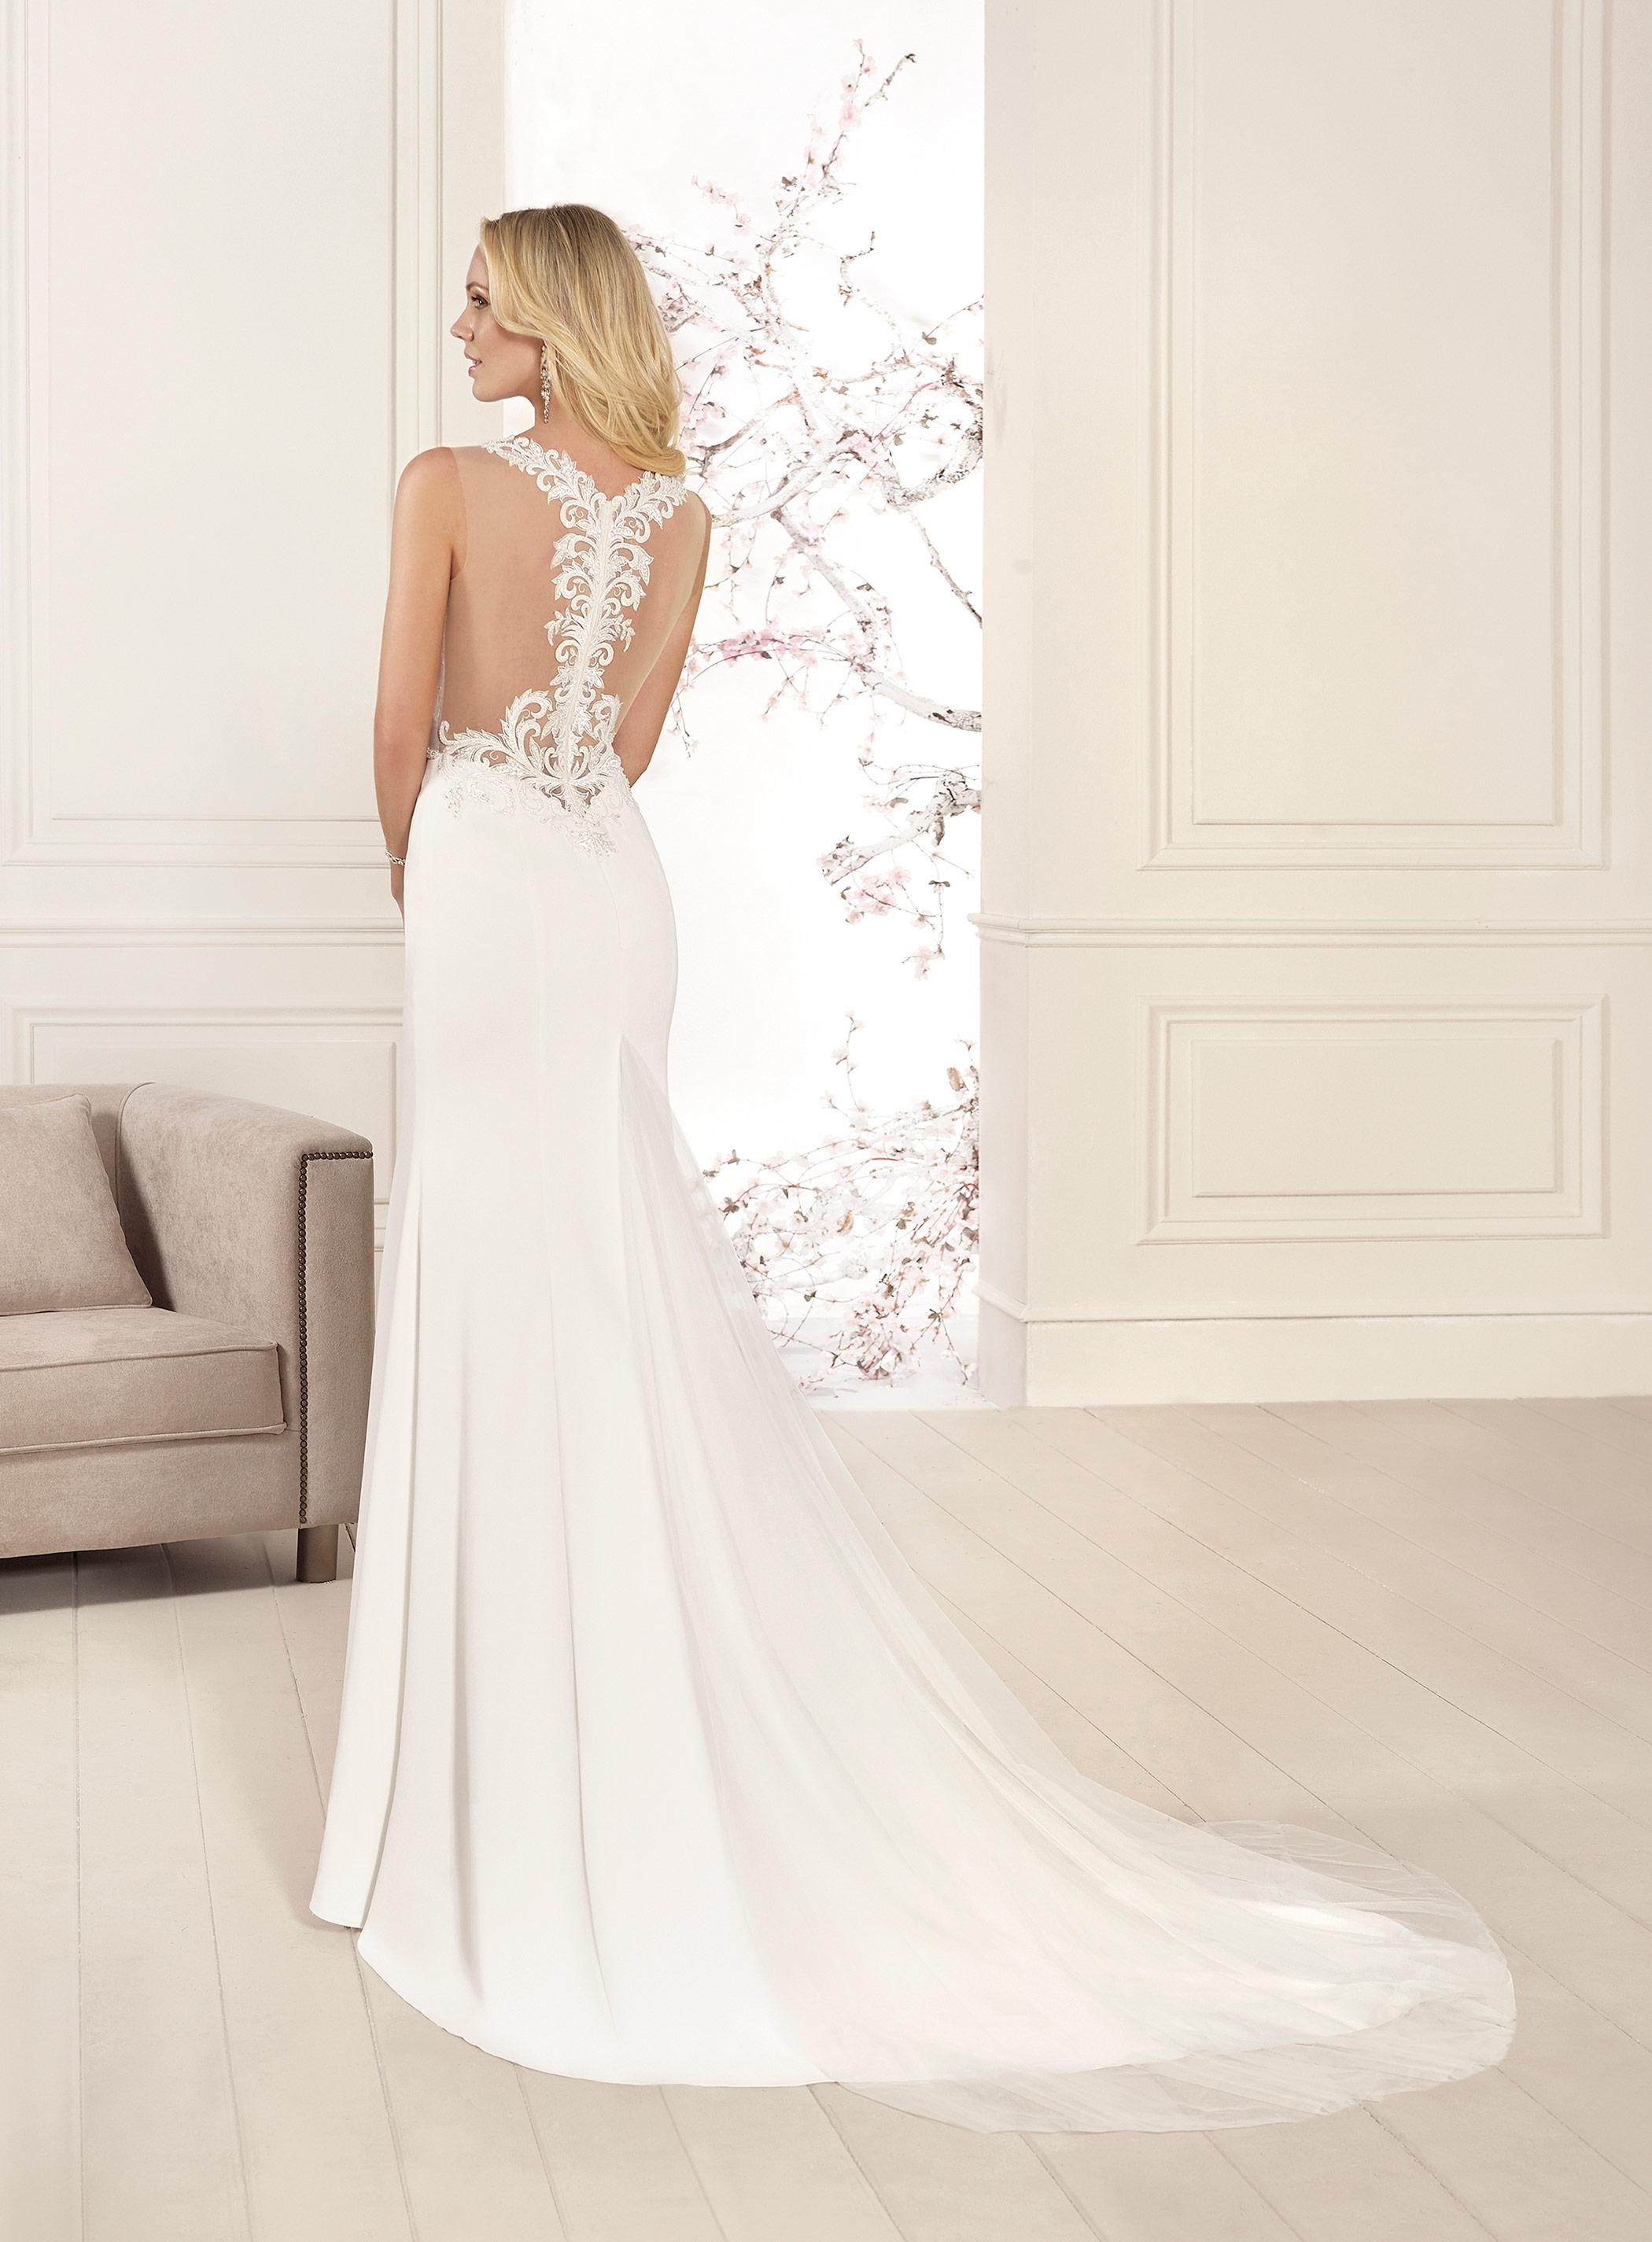 Sutton Bridal Studio Home Of Elegant Wedding Dresses